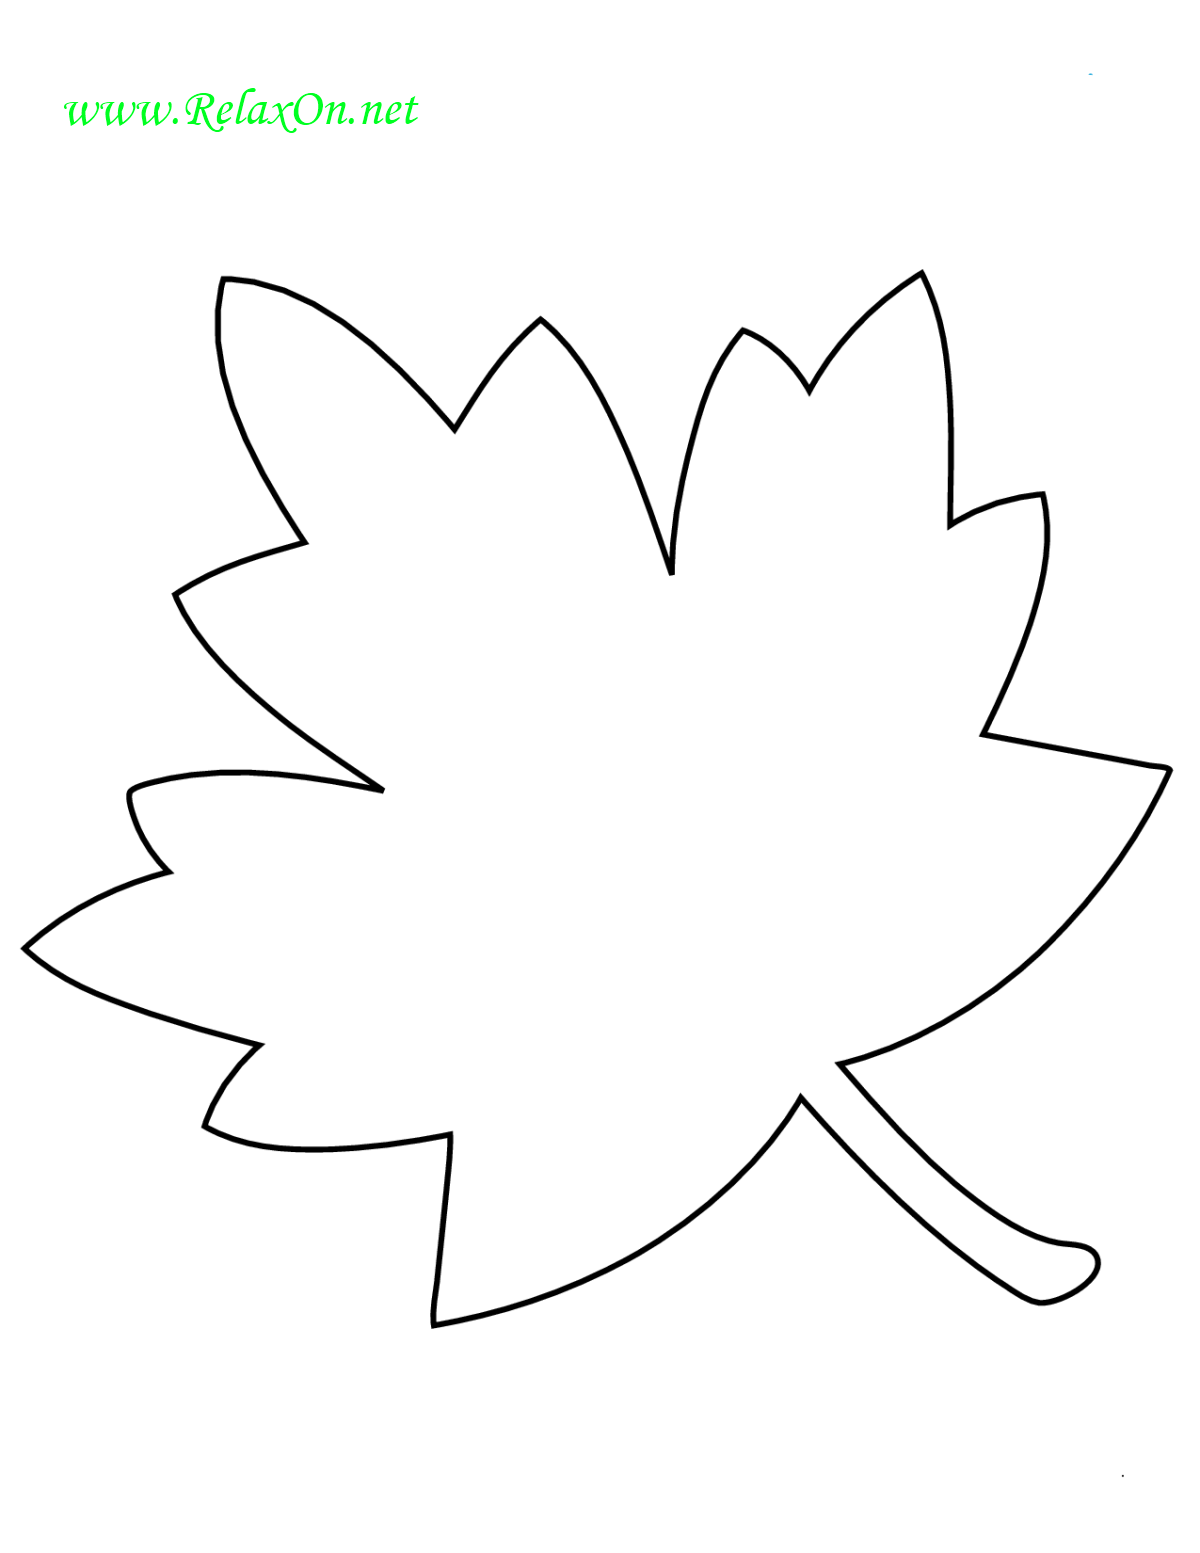 Трафарет листьев клена-3